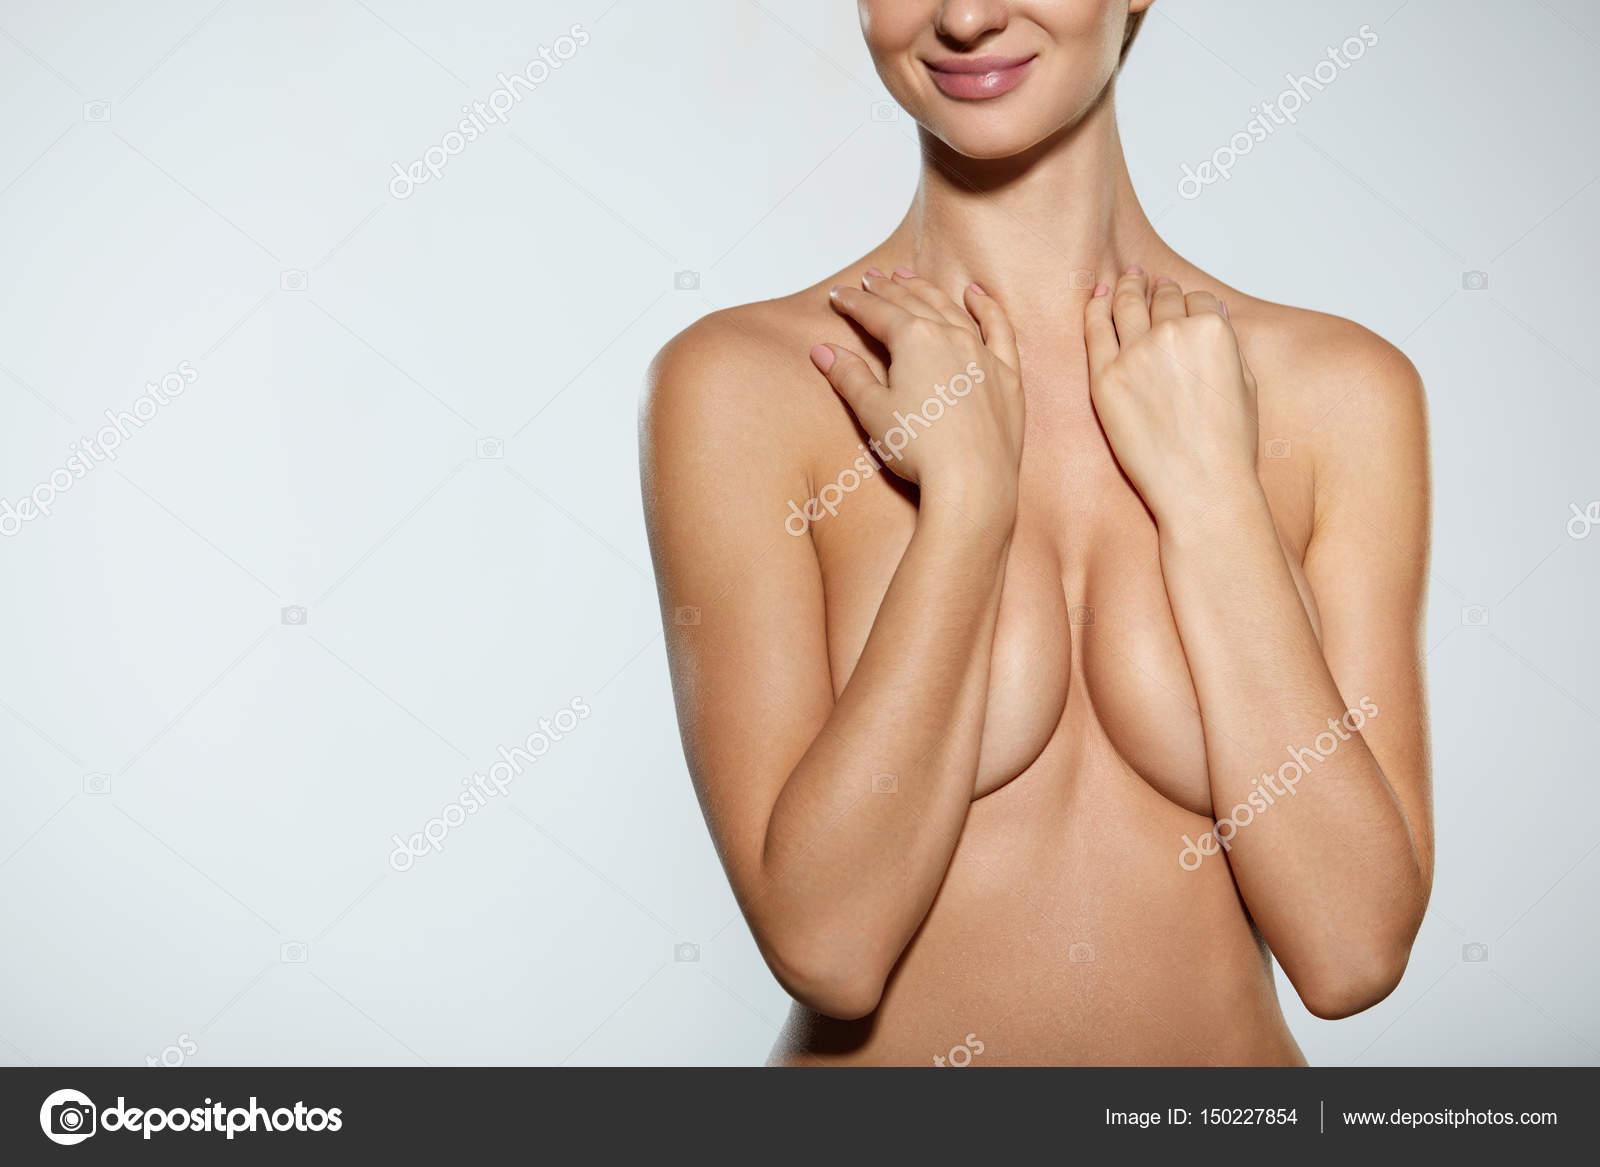 Gymnastics naked gymnast nude